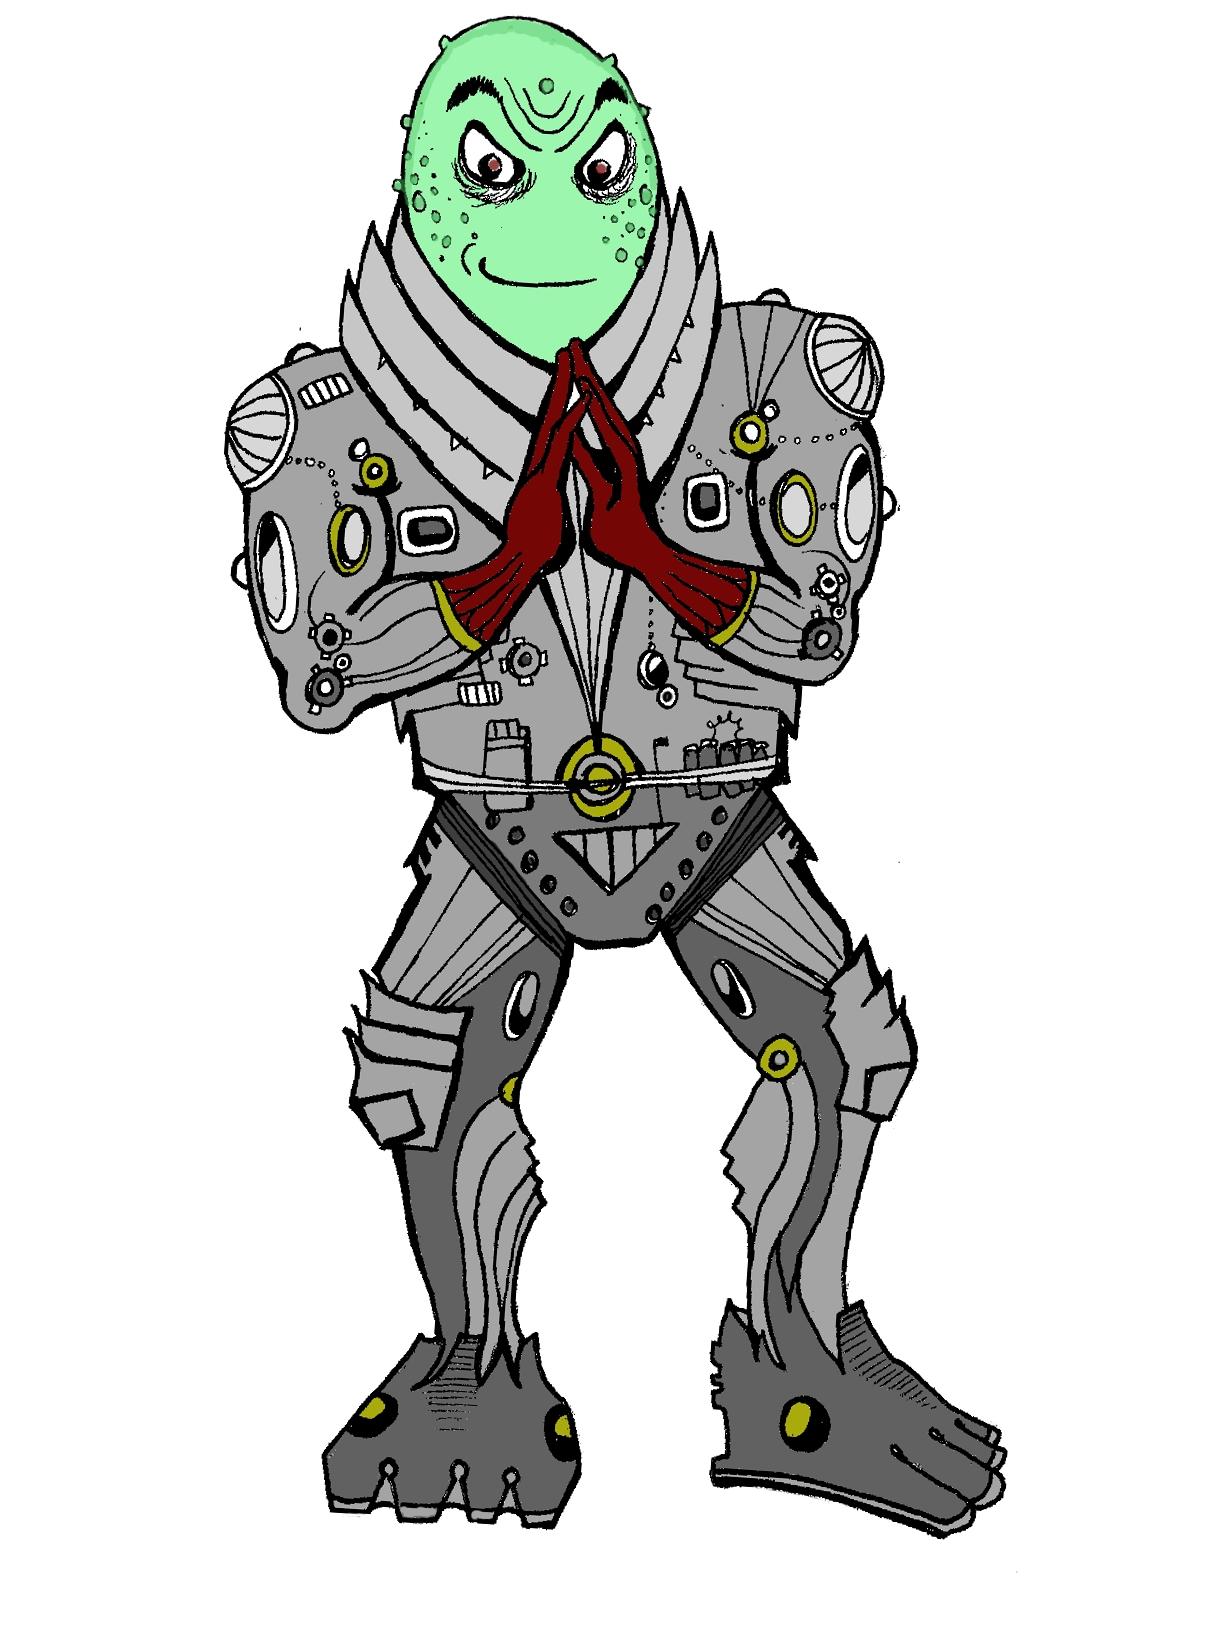 Alien Villain Mascot